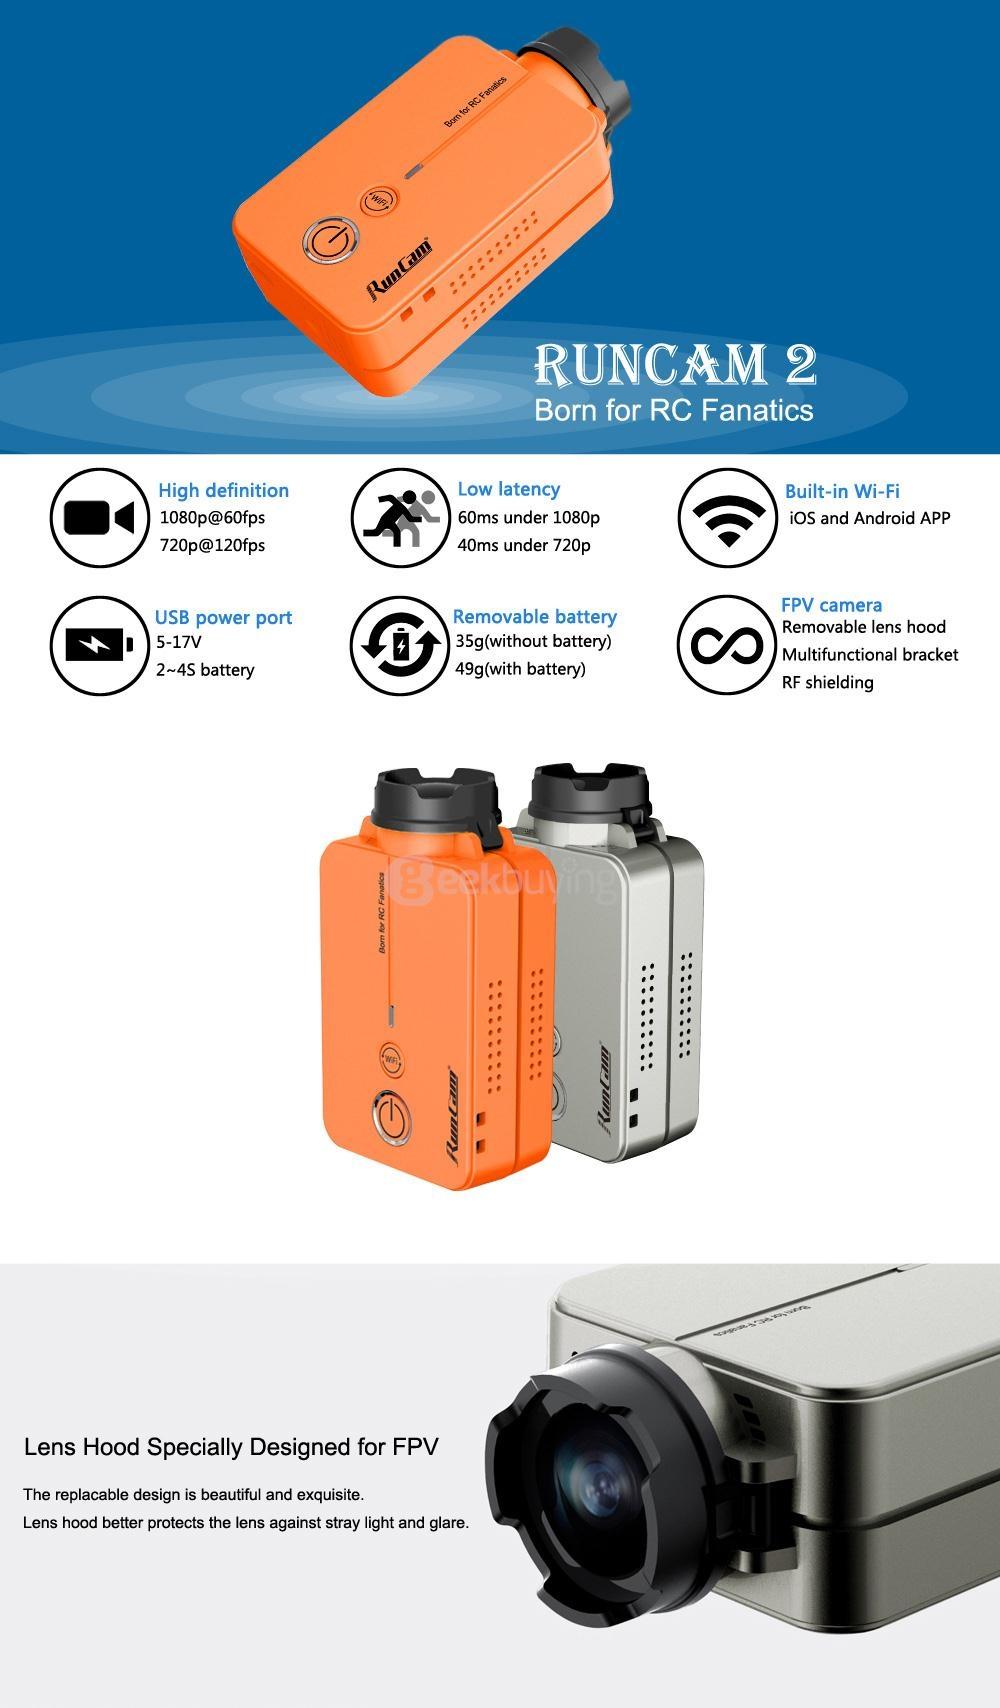 RunCam 2 RunCam2 1080P HD 120 Degree 4MP Wide Angle WiFi FPV Camera